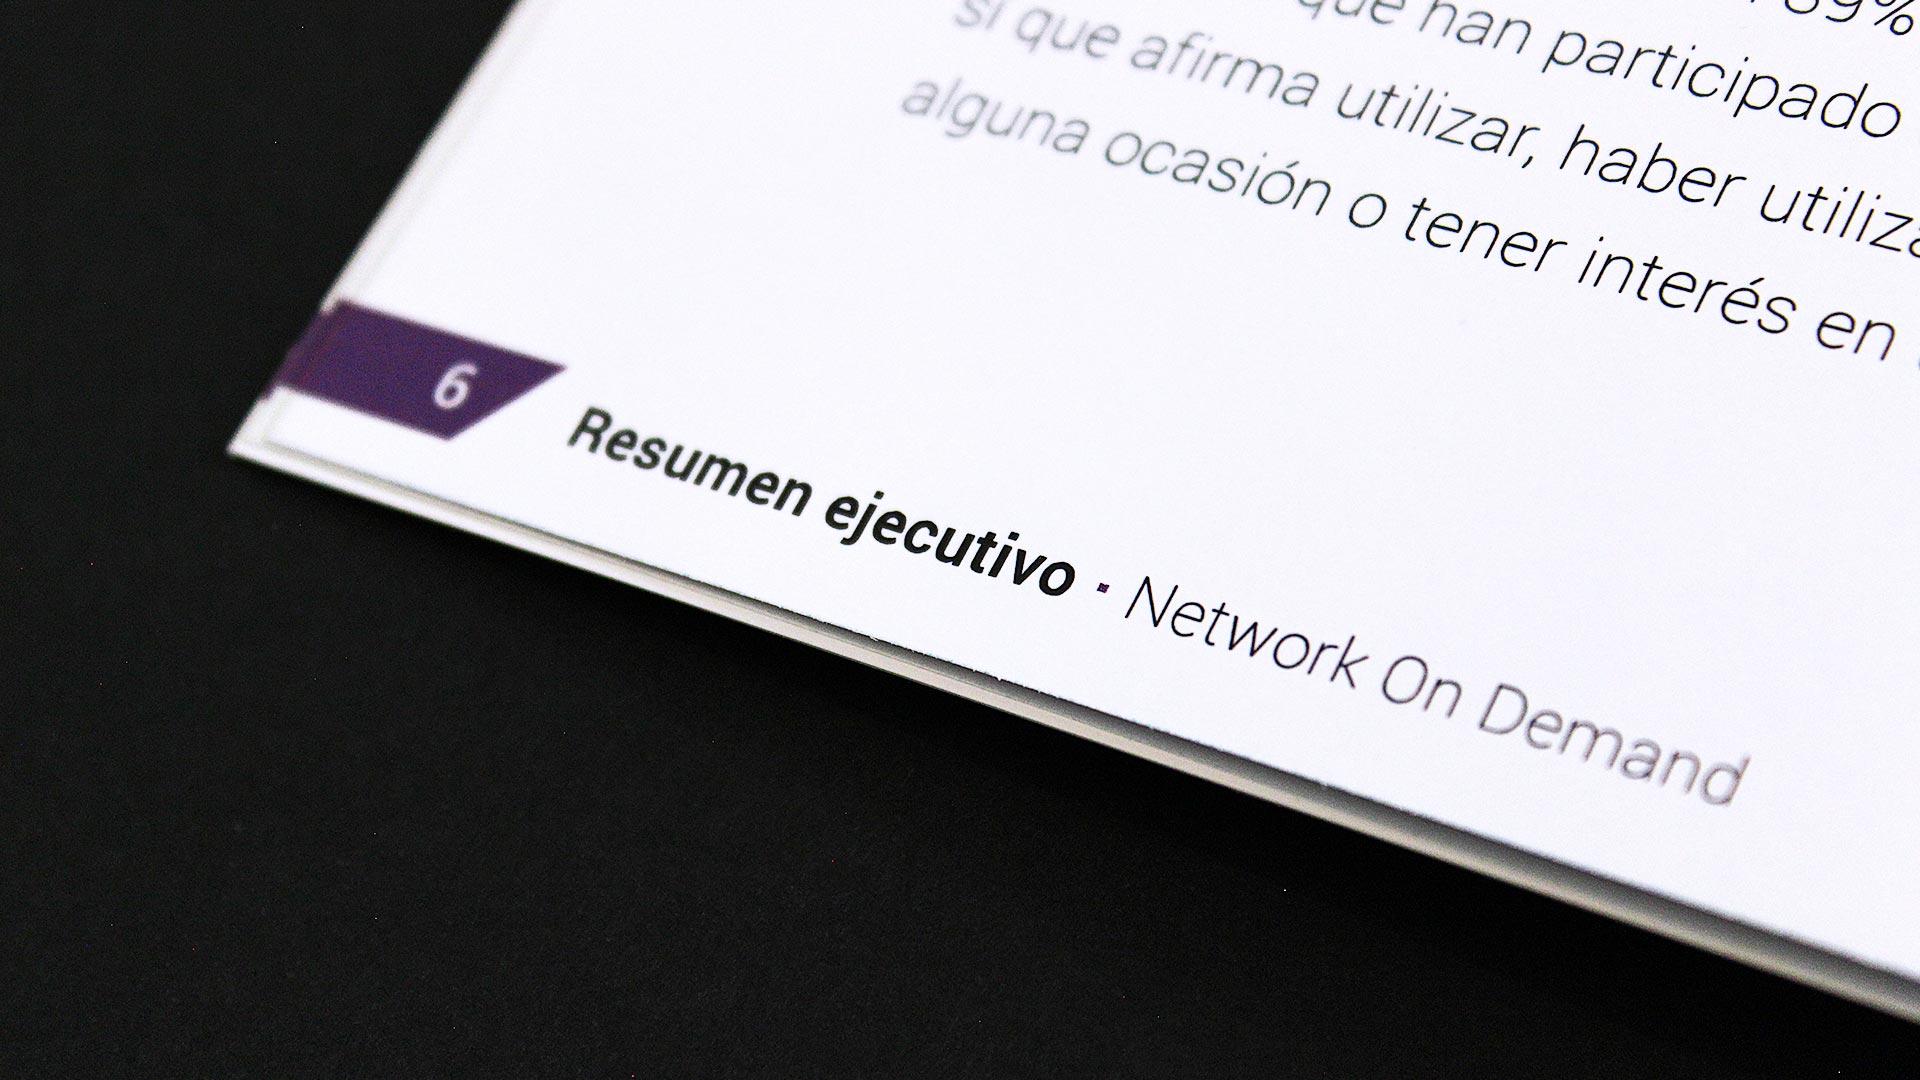 alcatel-content-marketing-informe-resumen-ejecutivo-networkondemand-ebook-2016-16